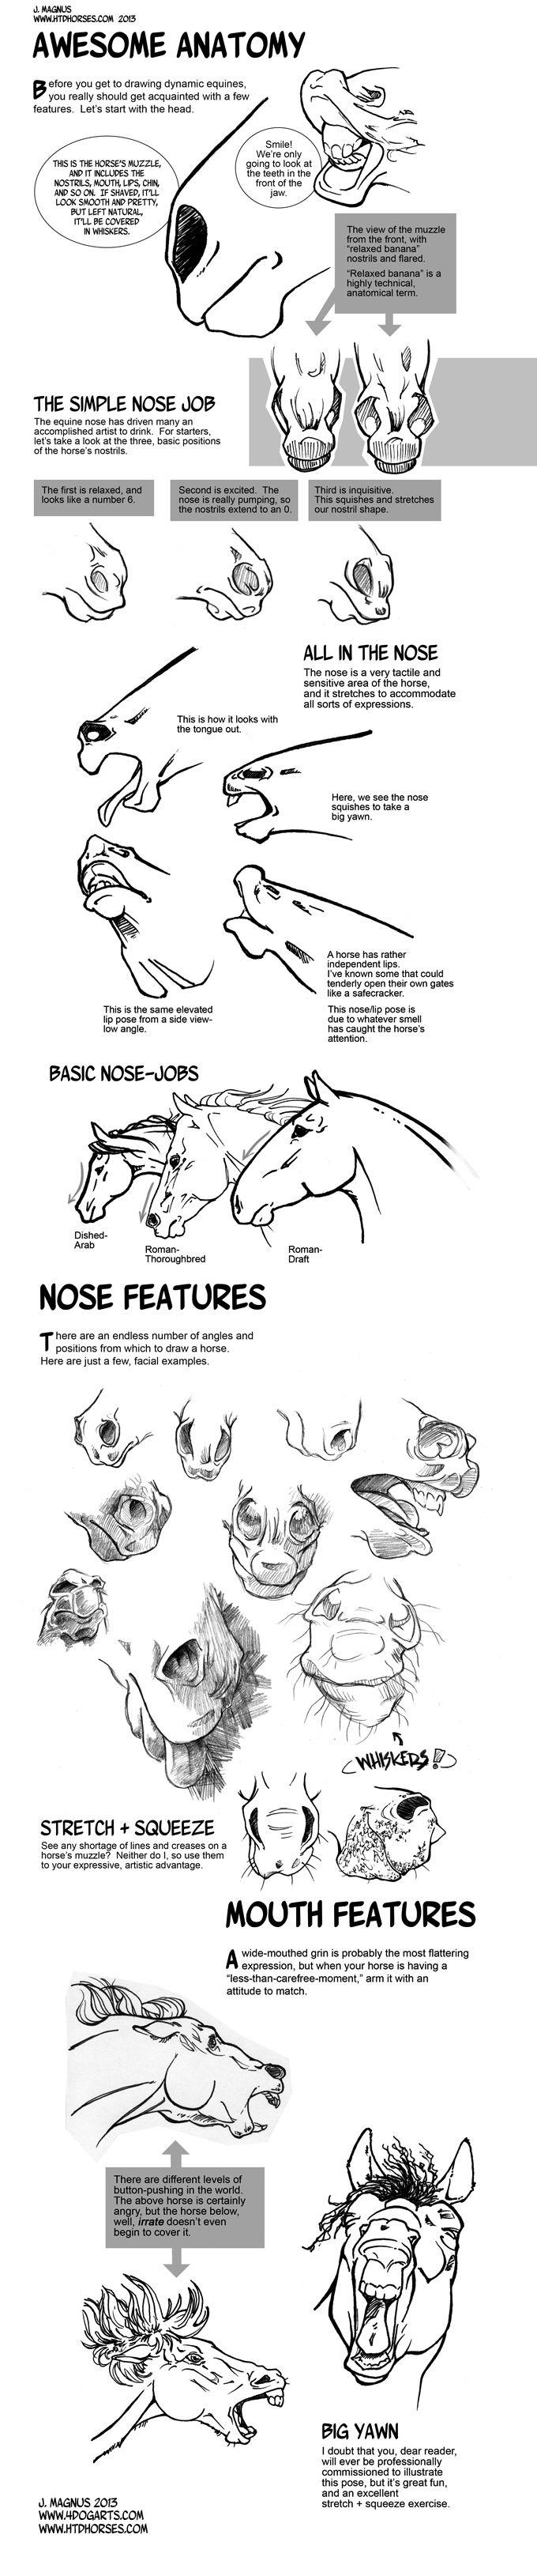 Pin by Lisa Flecki on zeichnen   Pinterest   Horse anatomy, Anatomy ...